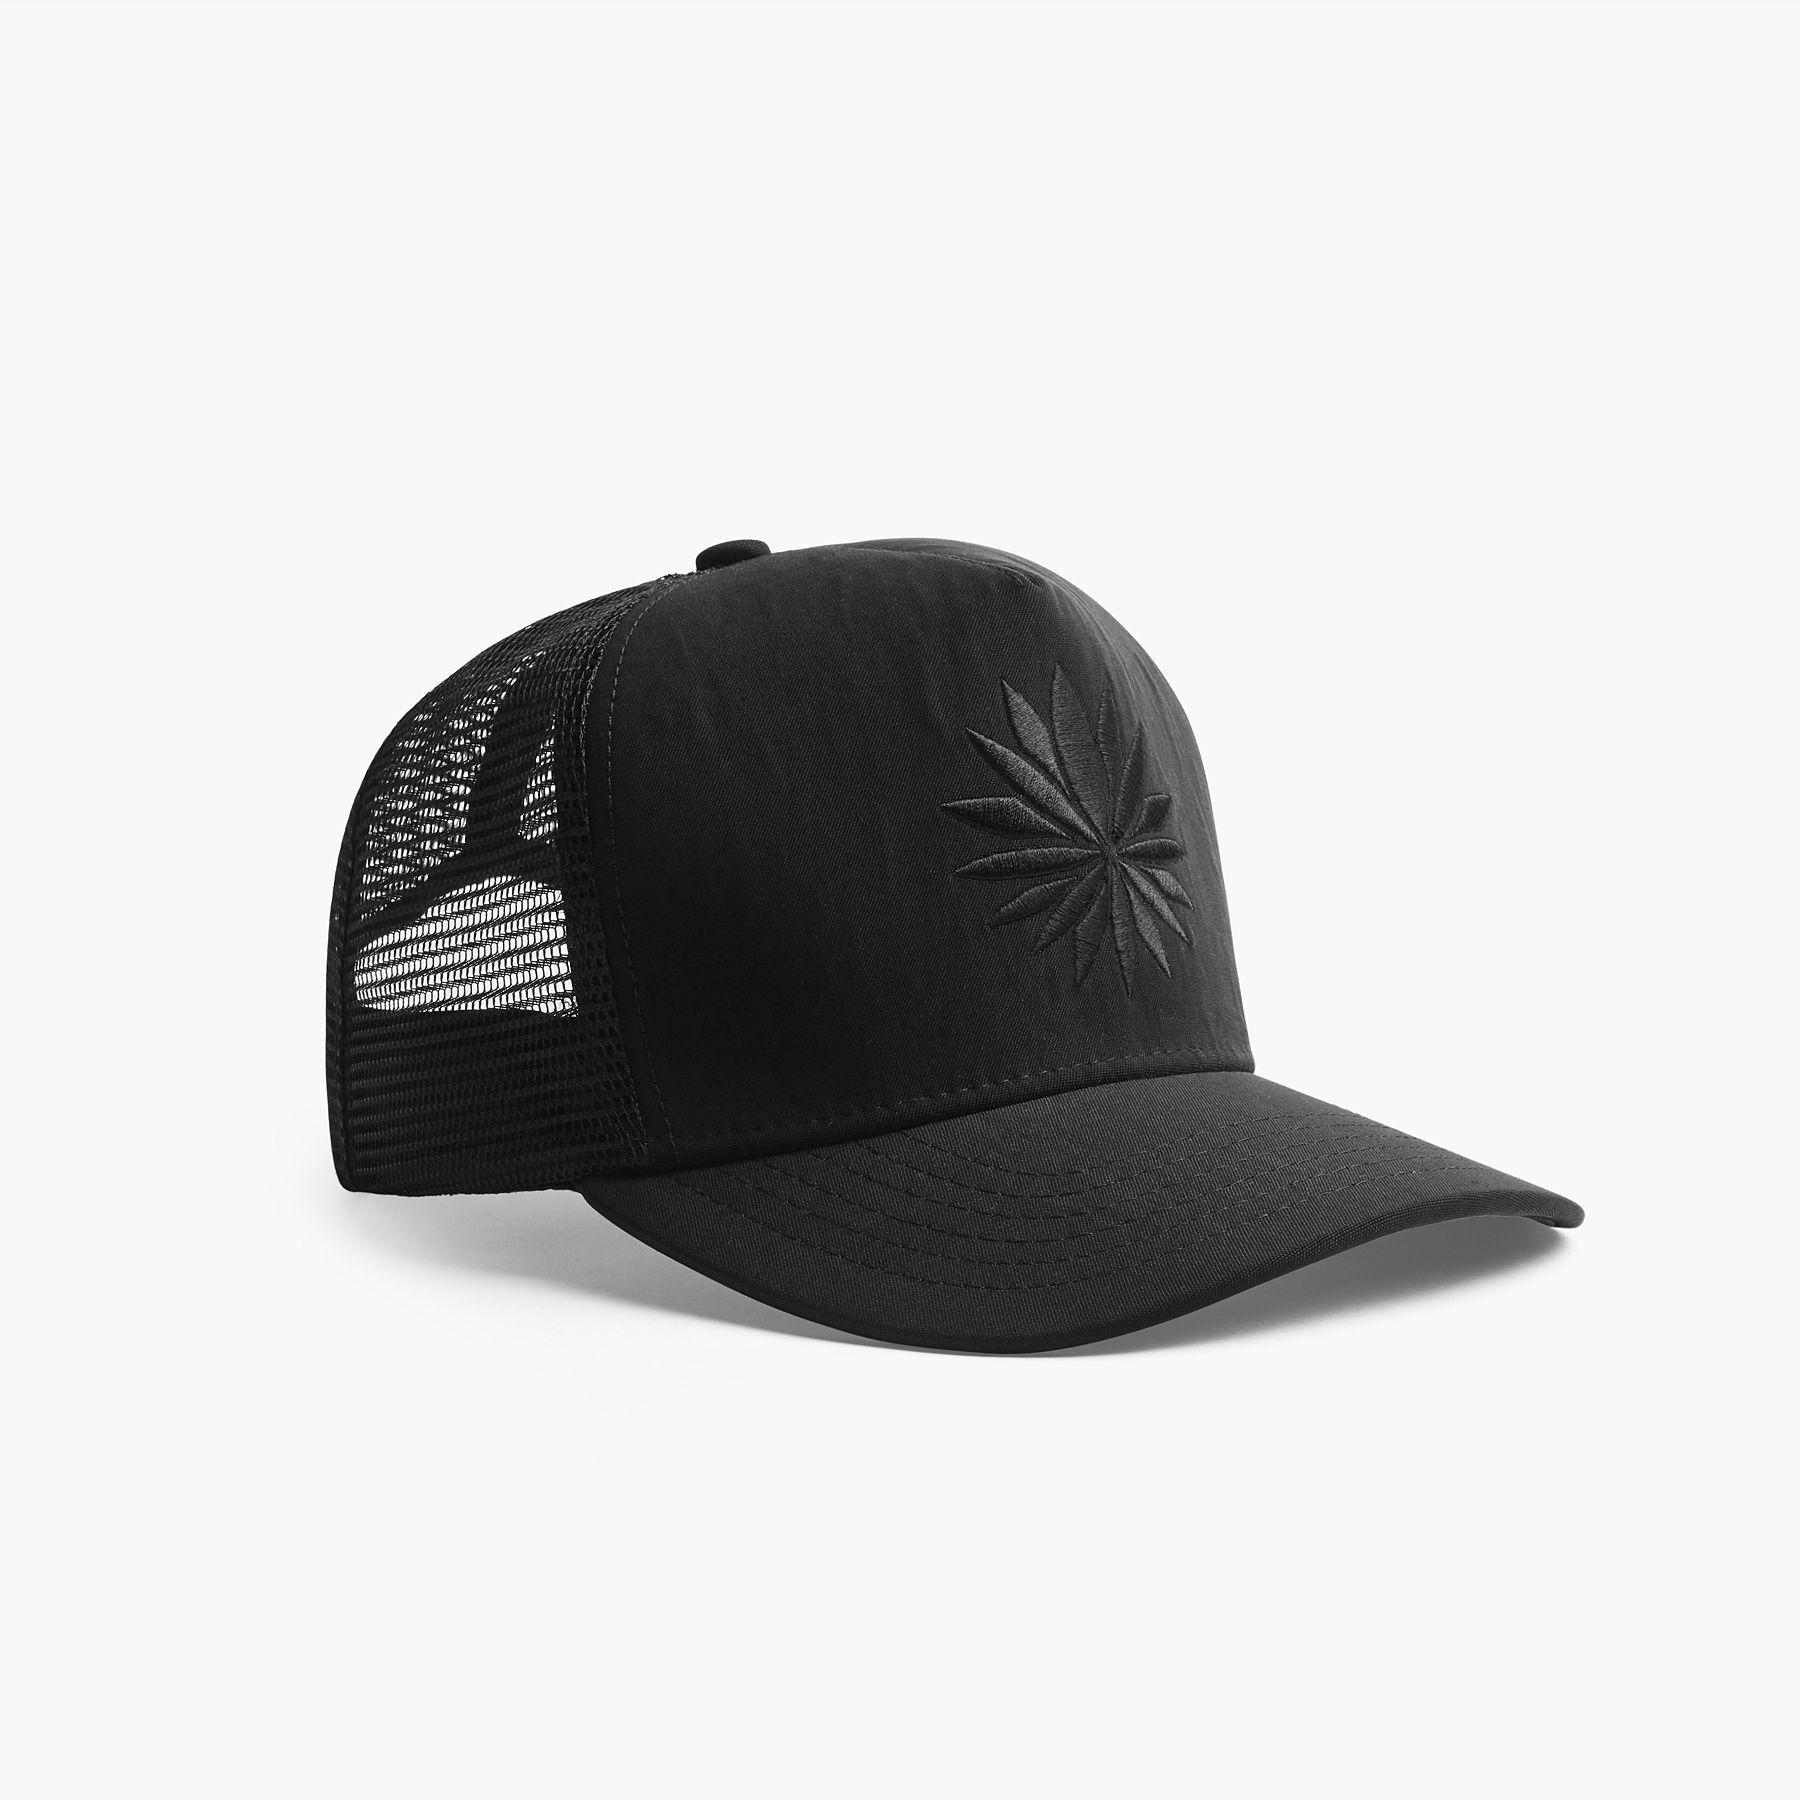 6fdfbdbb3fc Lyst - James Perse Nylon Lotus Trucker Hat in Black for Men